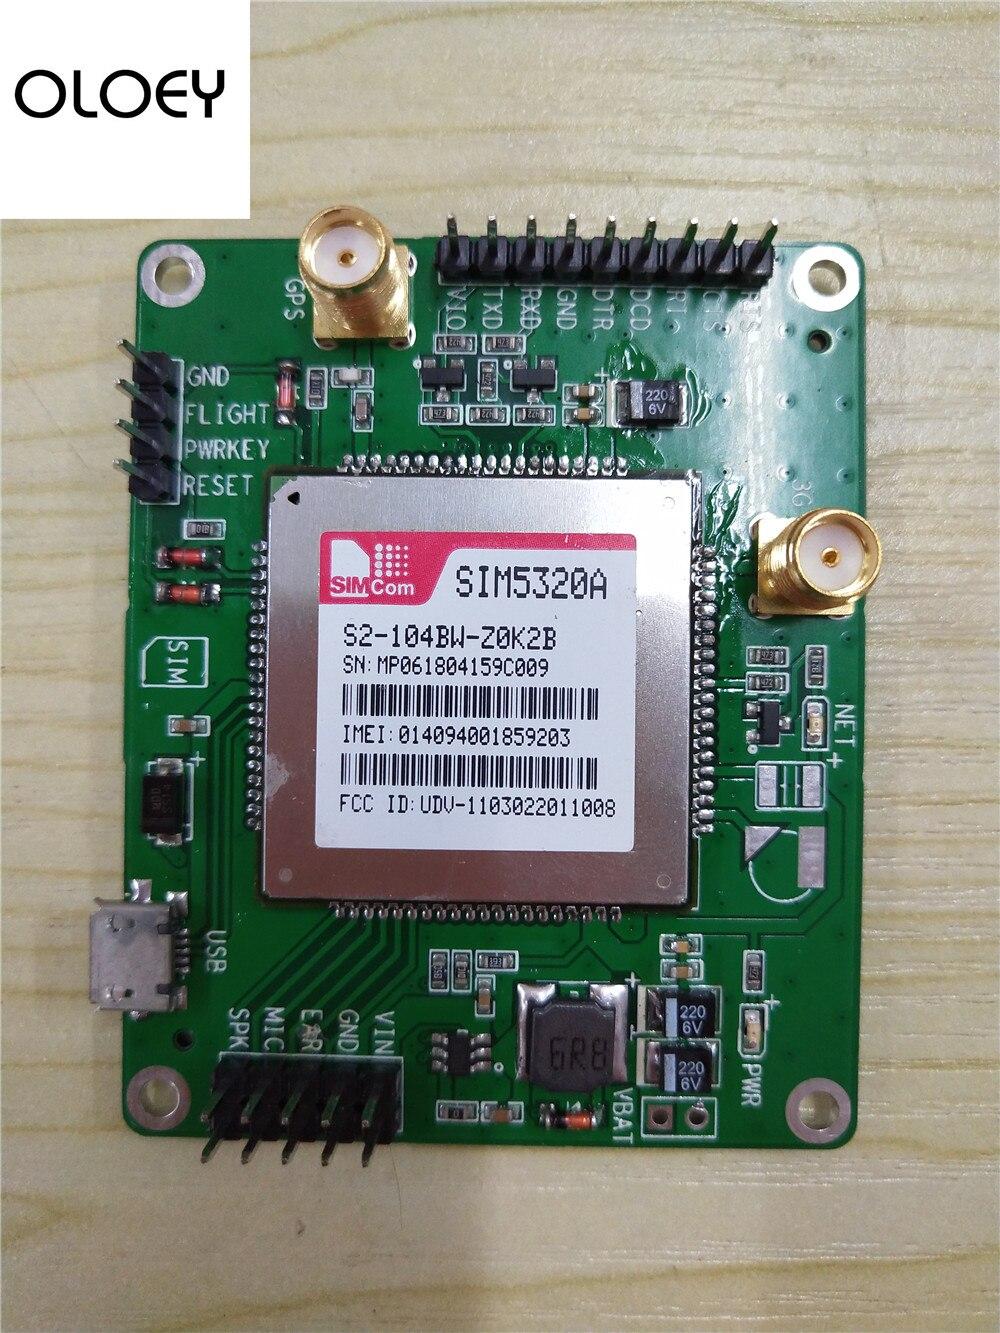 SIM5320A Development Boards